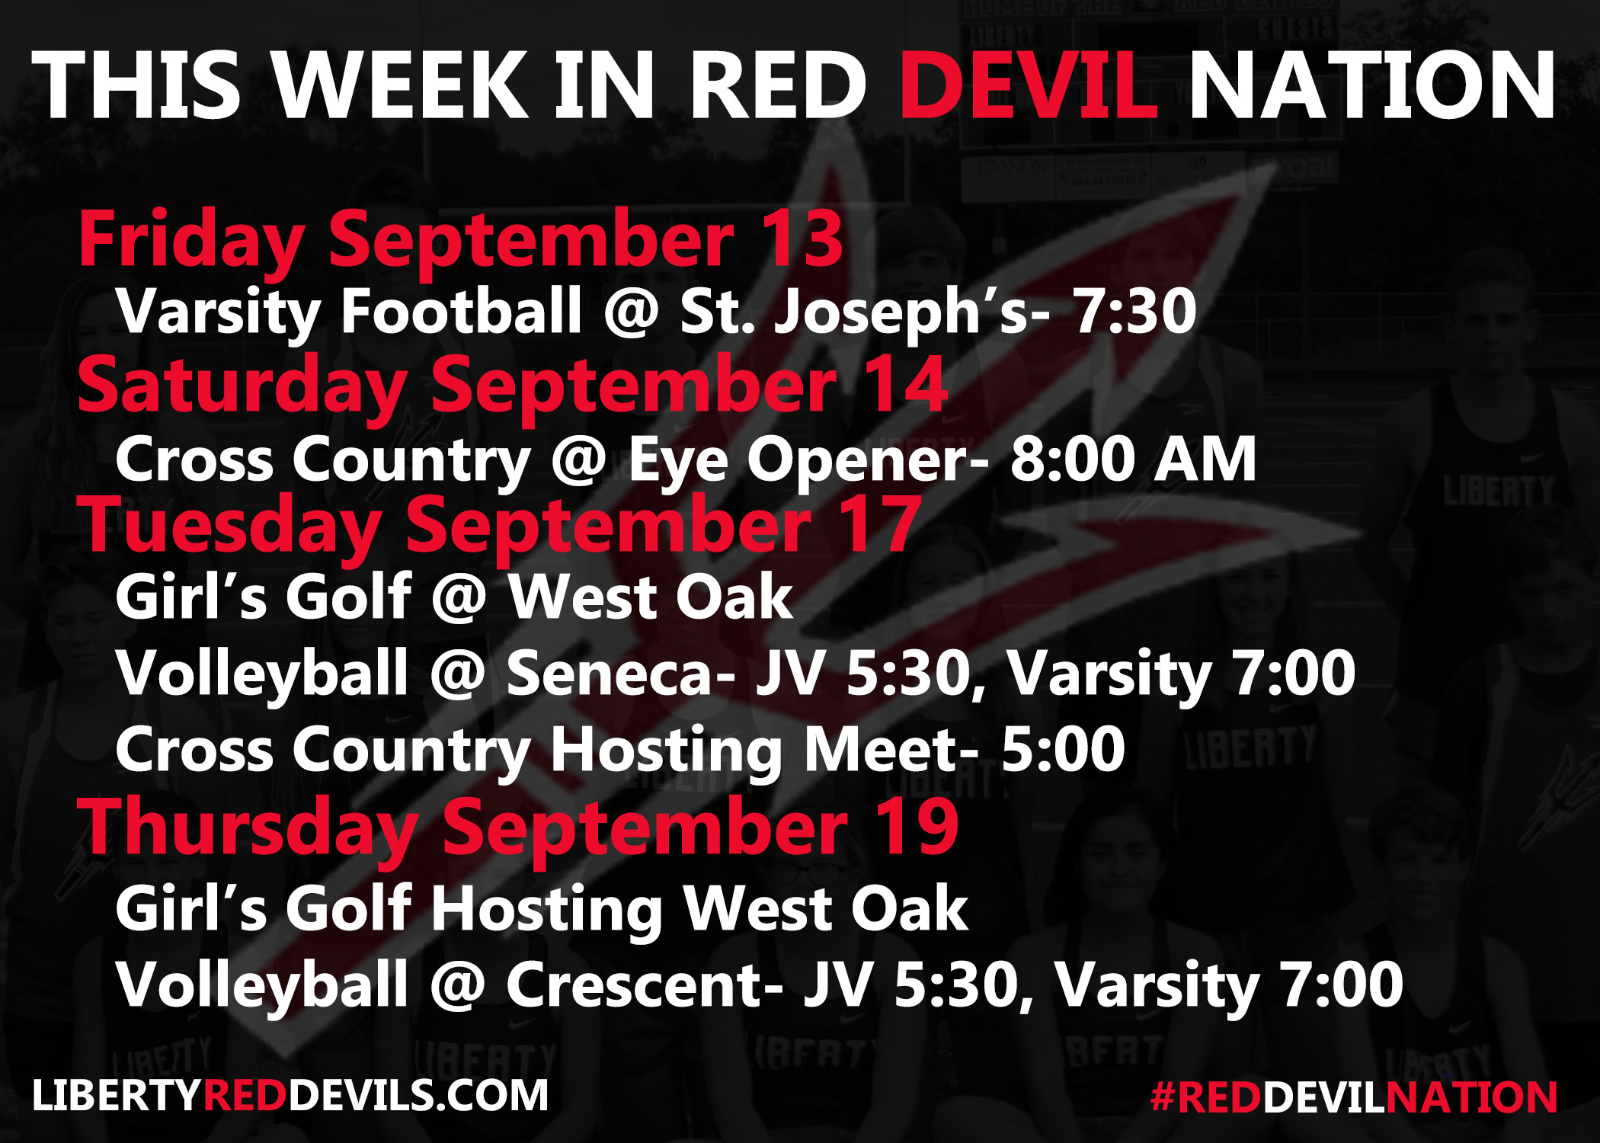 This Week in #reddevilnation 9/13-9/19